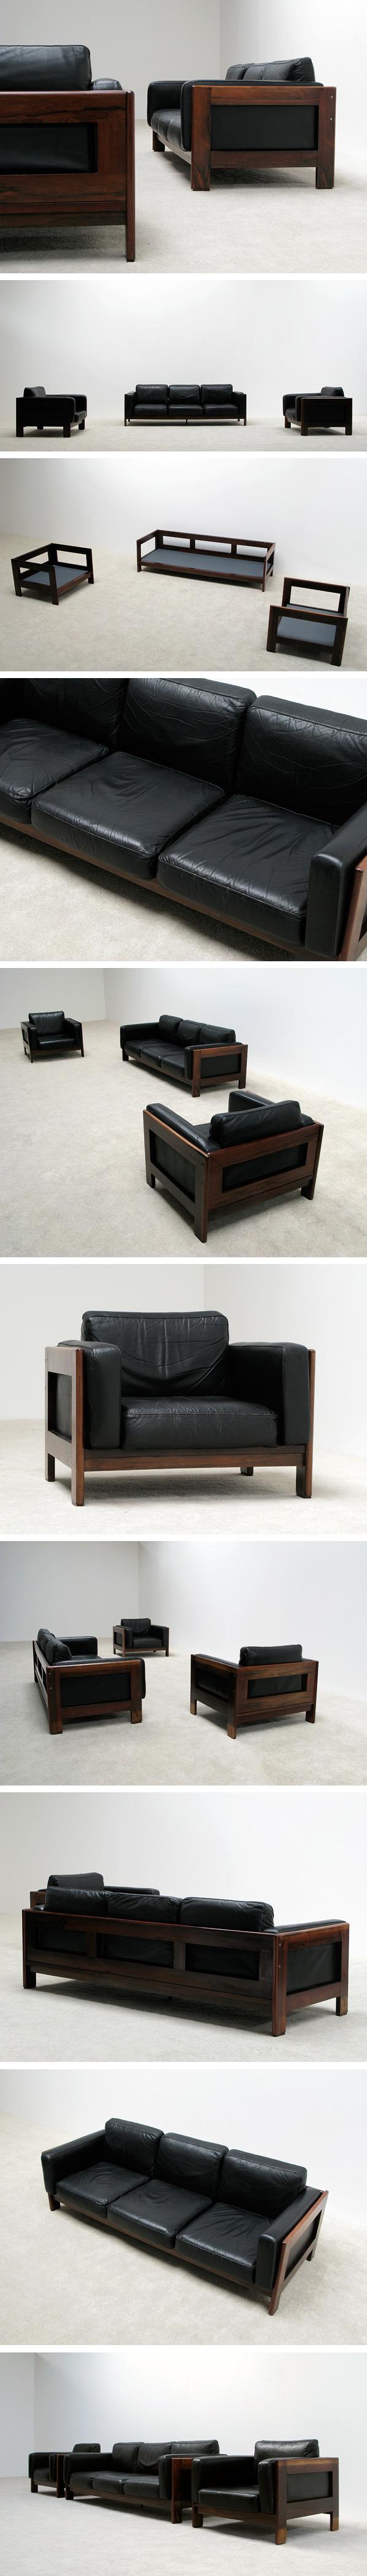 Leather Rosewood 3+1+1 seat sofa Bastiano Tobia Scarpa Large